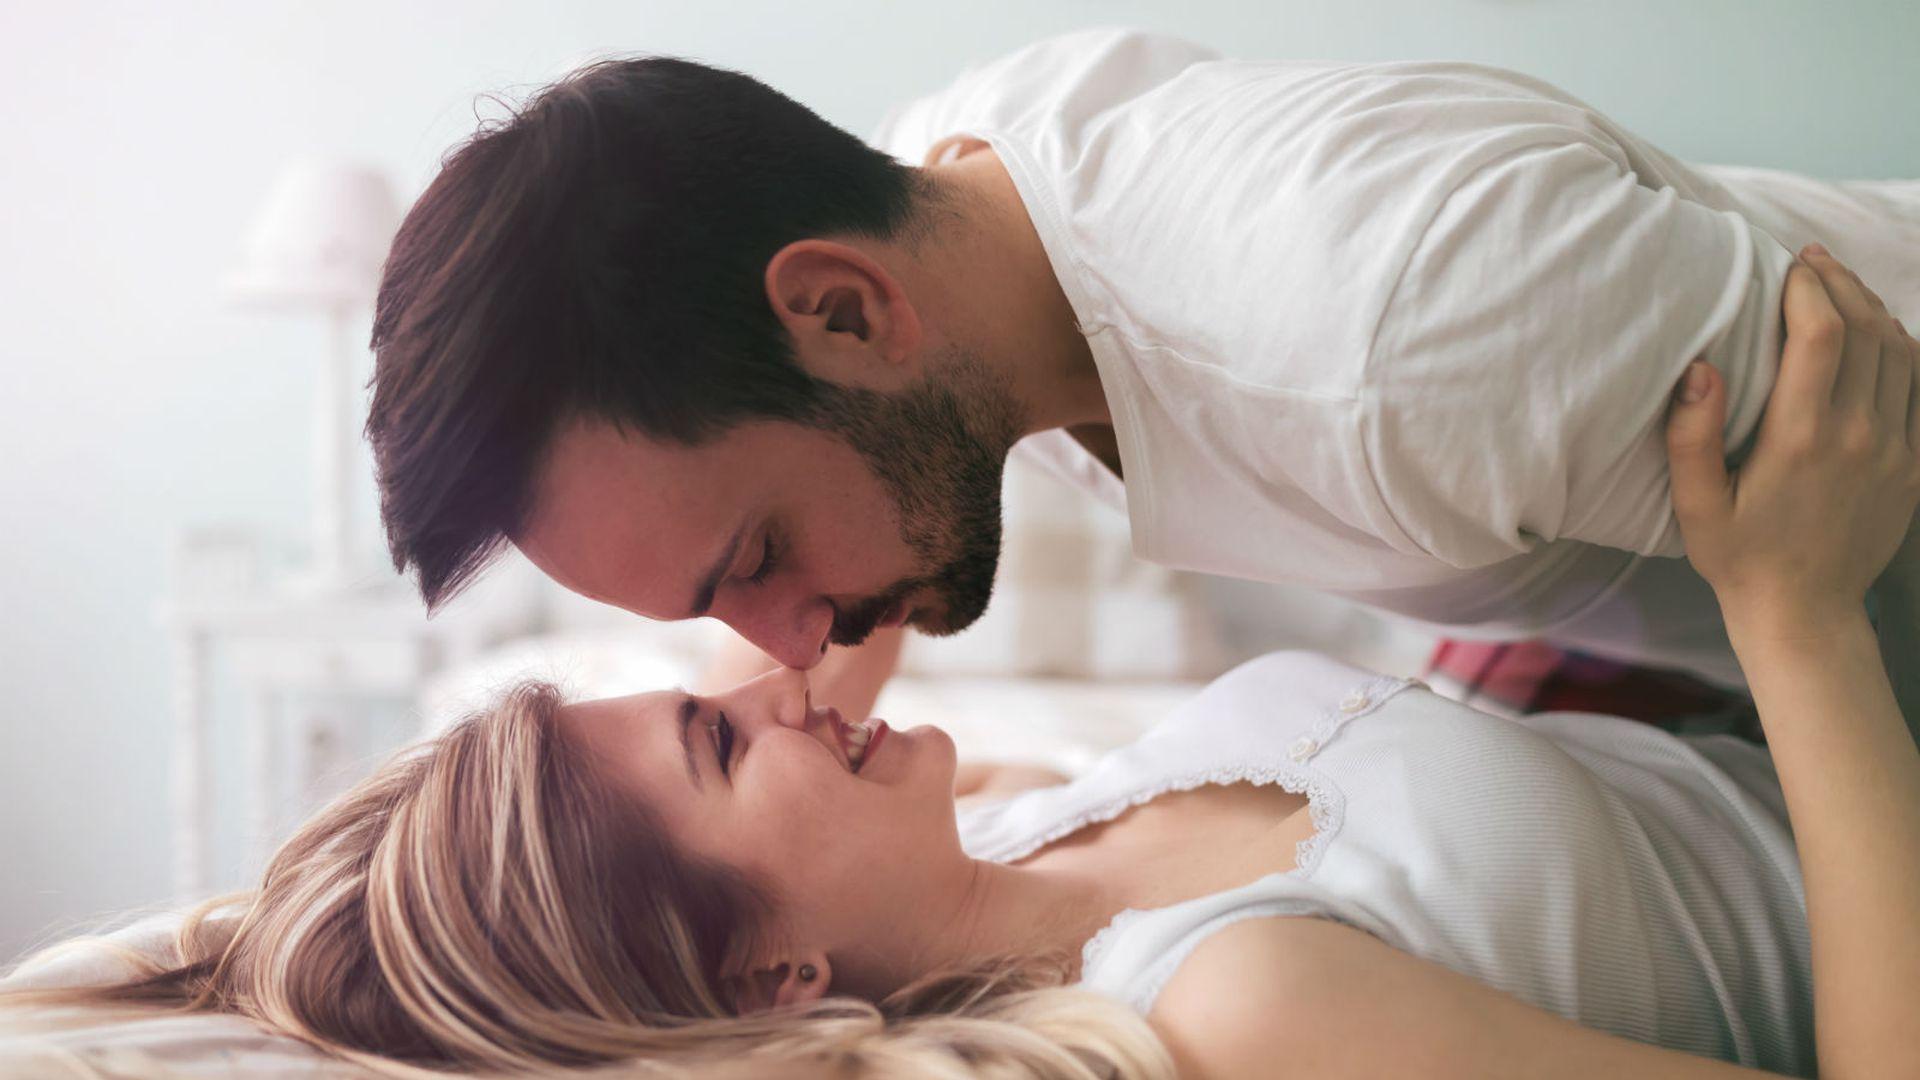 zašto žena curi za vrijeme seksa veliki magarci veliki penis porno